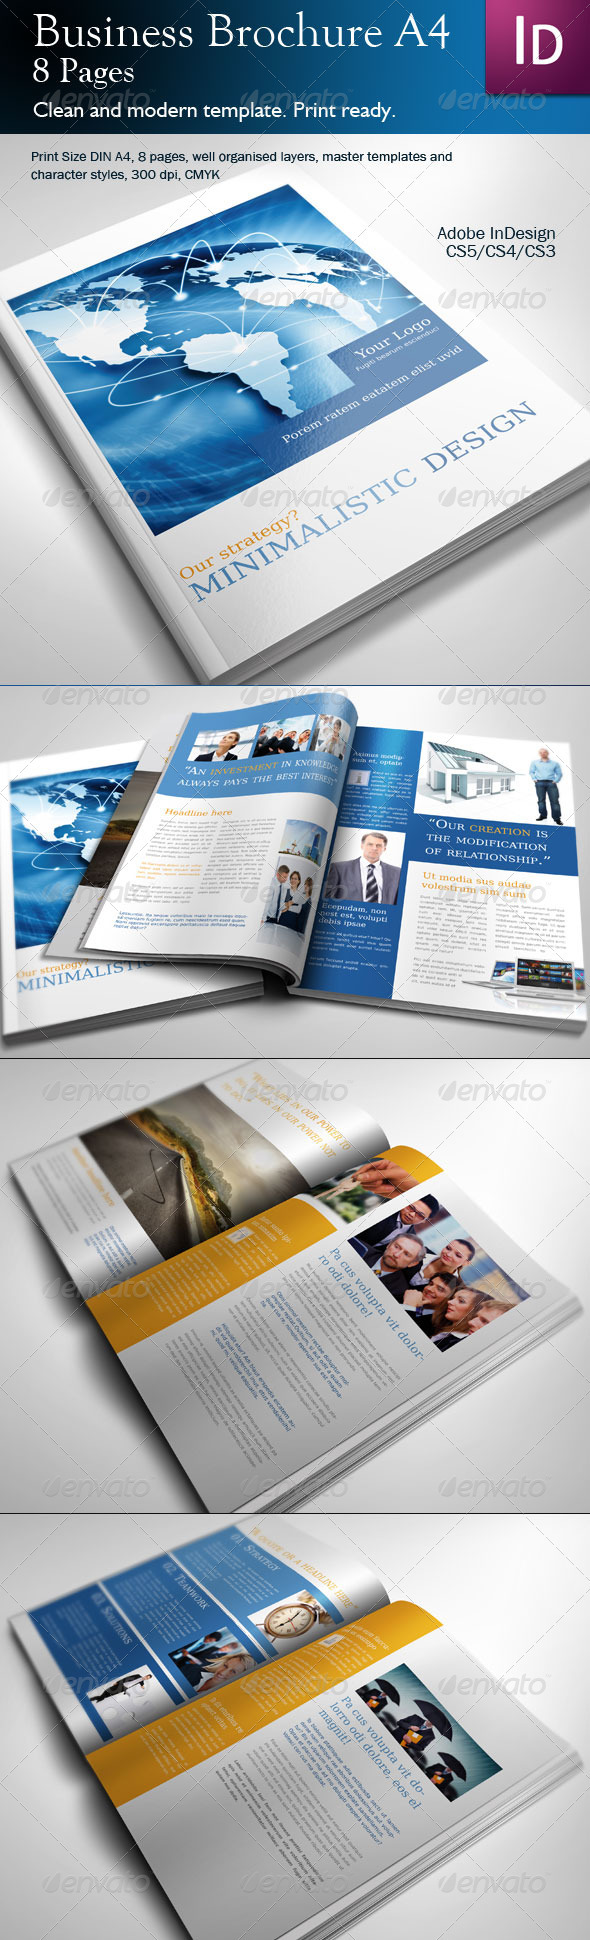 GraphicRiver Business Brochure A4 478068